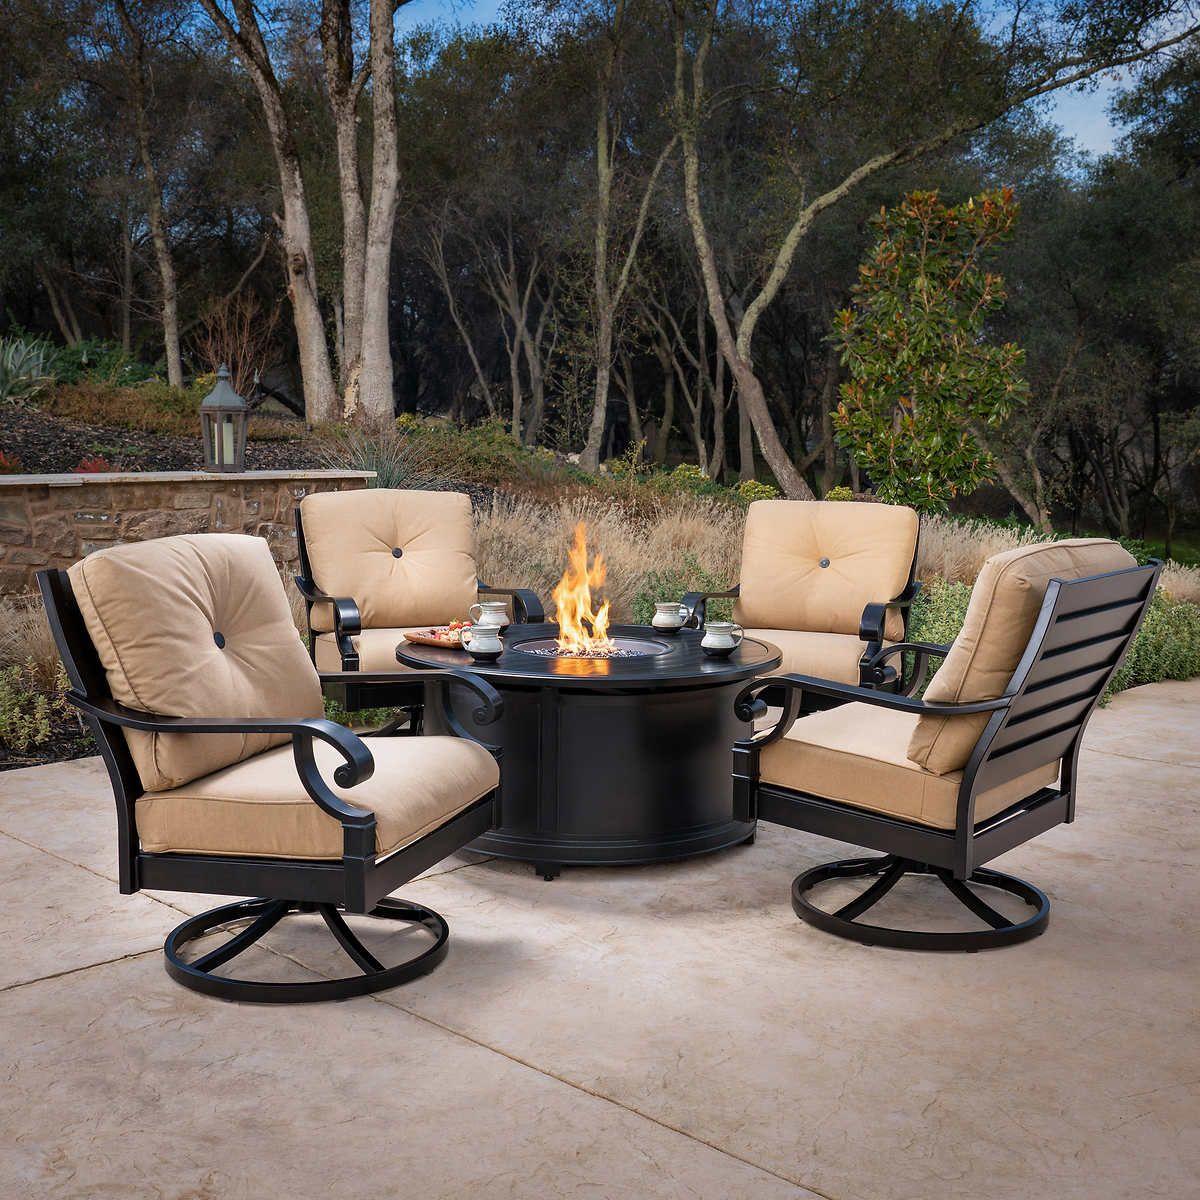 Verena 5 Piece Fire Chat Set Costco Patio Furniture Outdoor